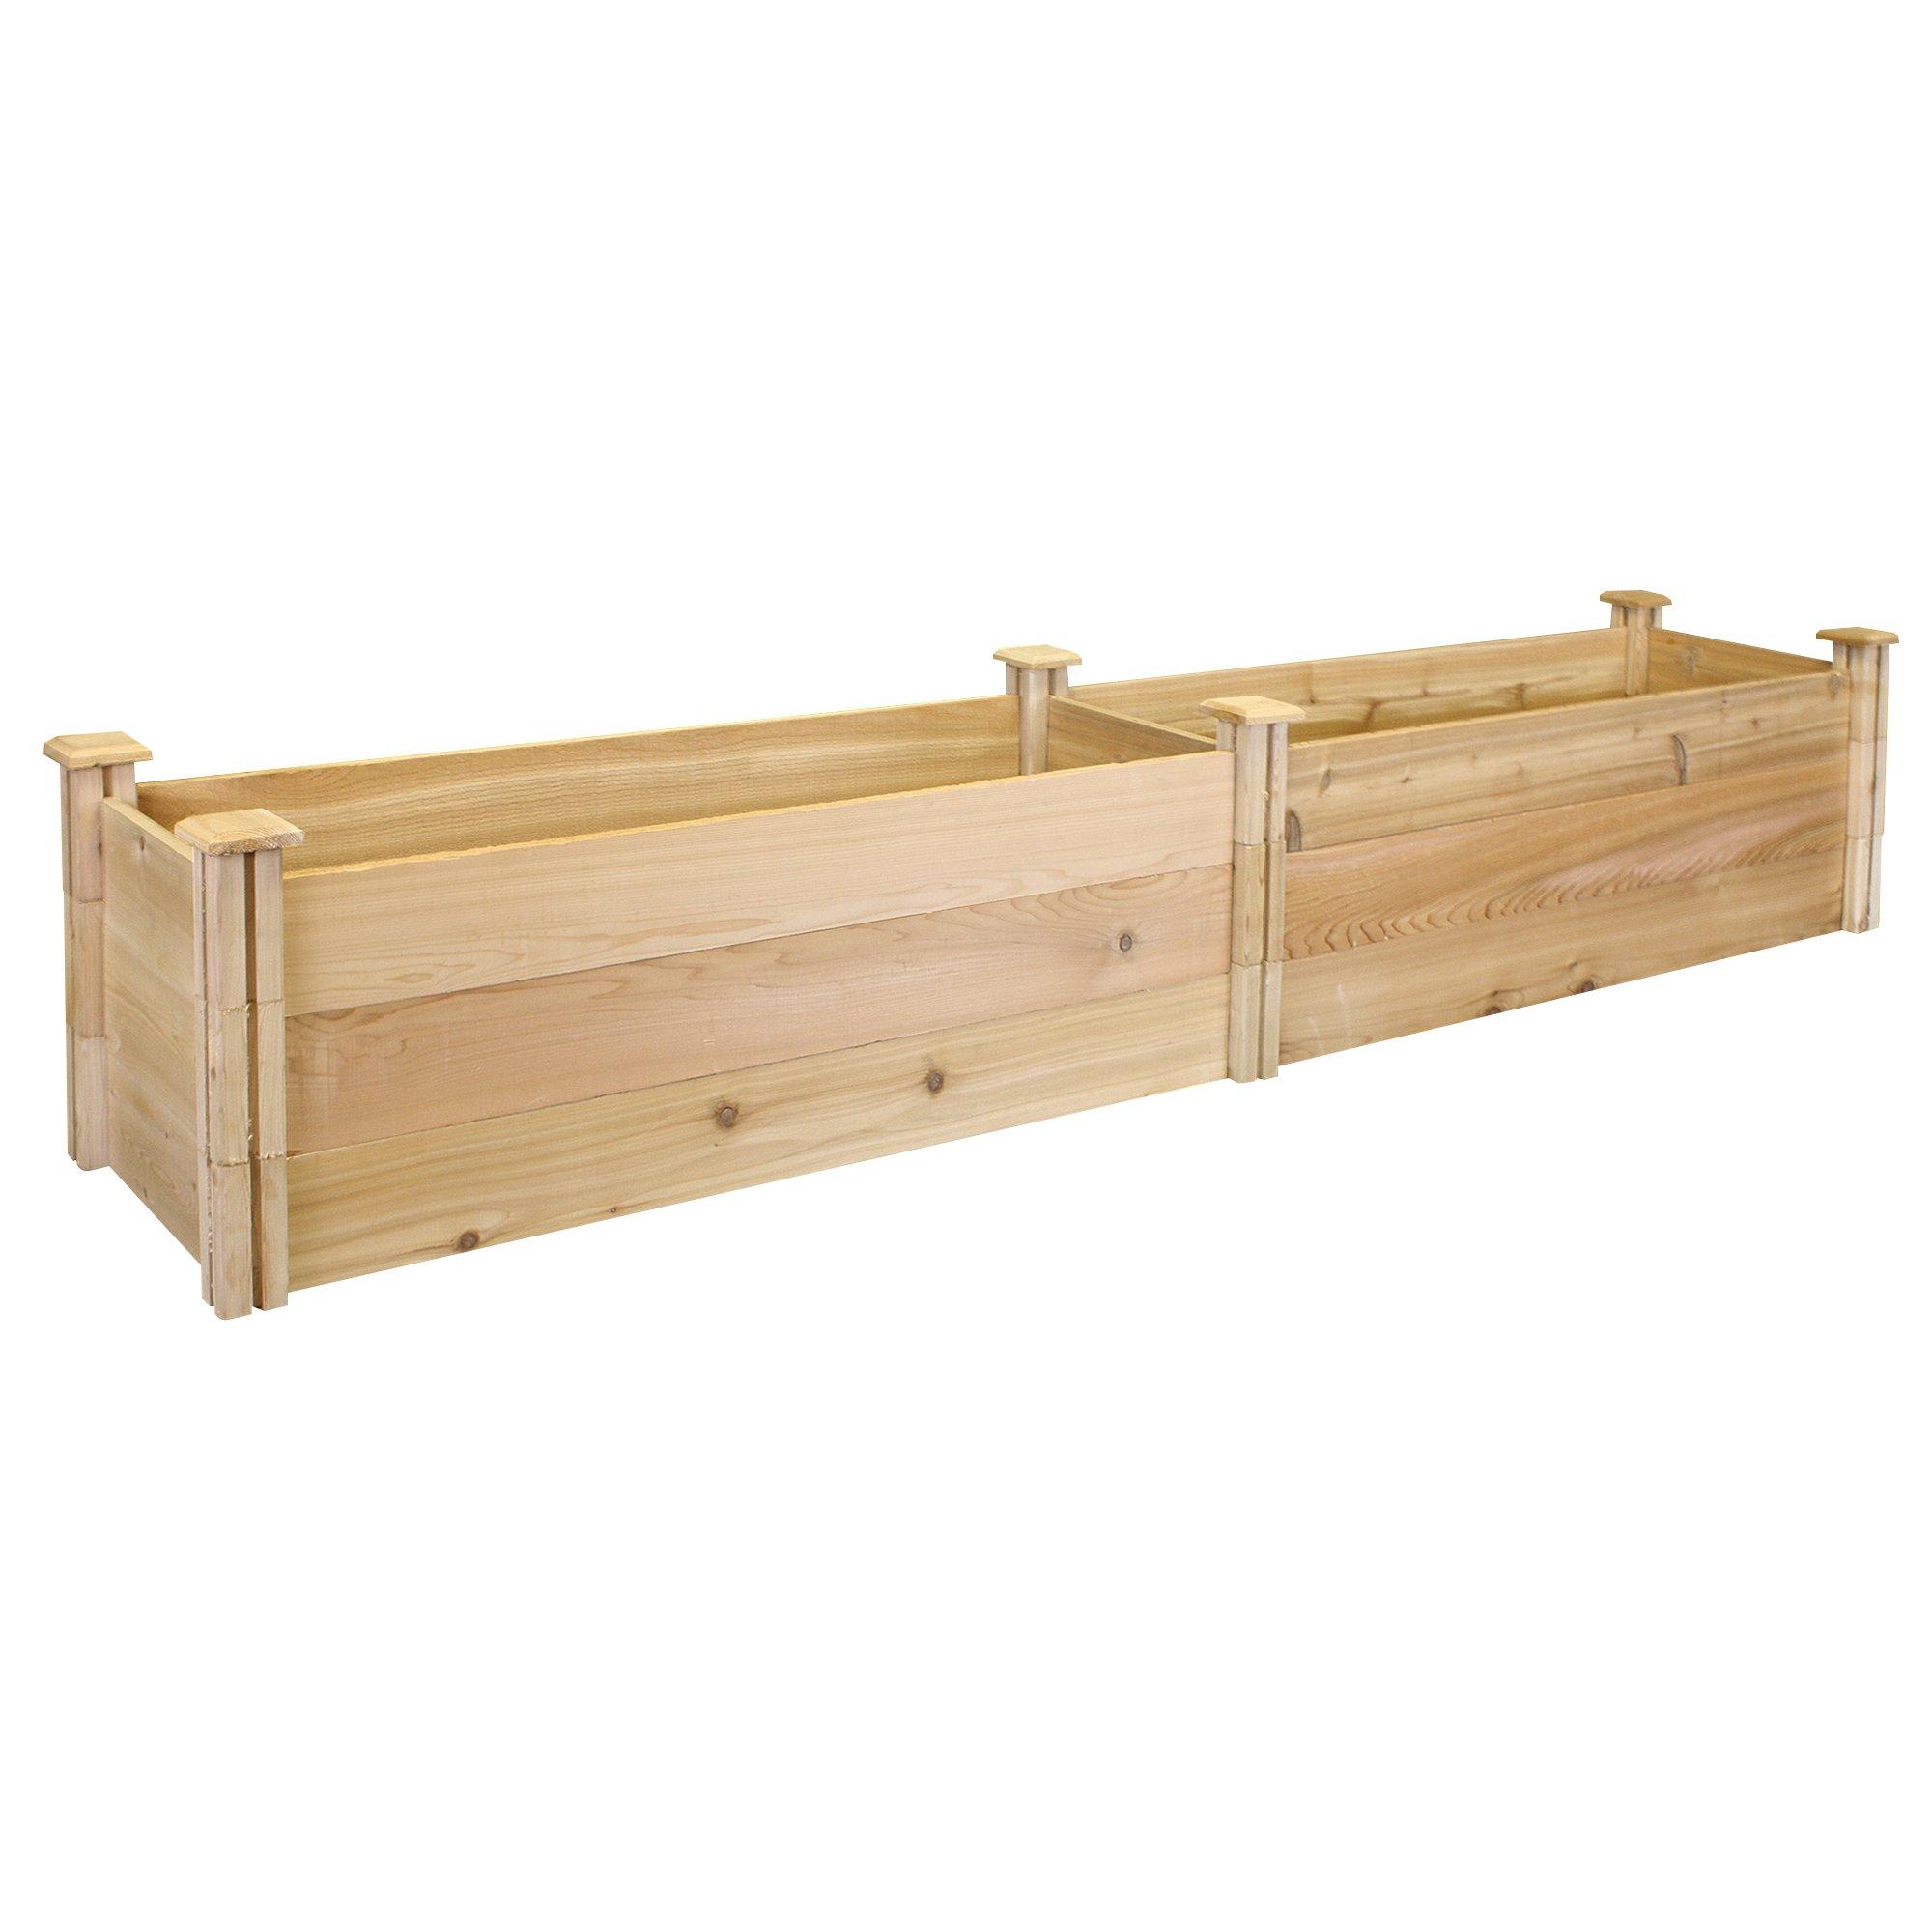 Greenes Fence Premium Cedar Raised Garden Bed, 16'' x 96'' x 16.5'' by Greenes Fence